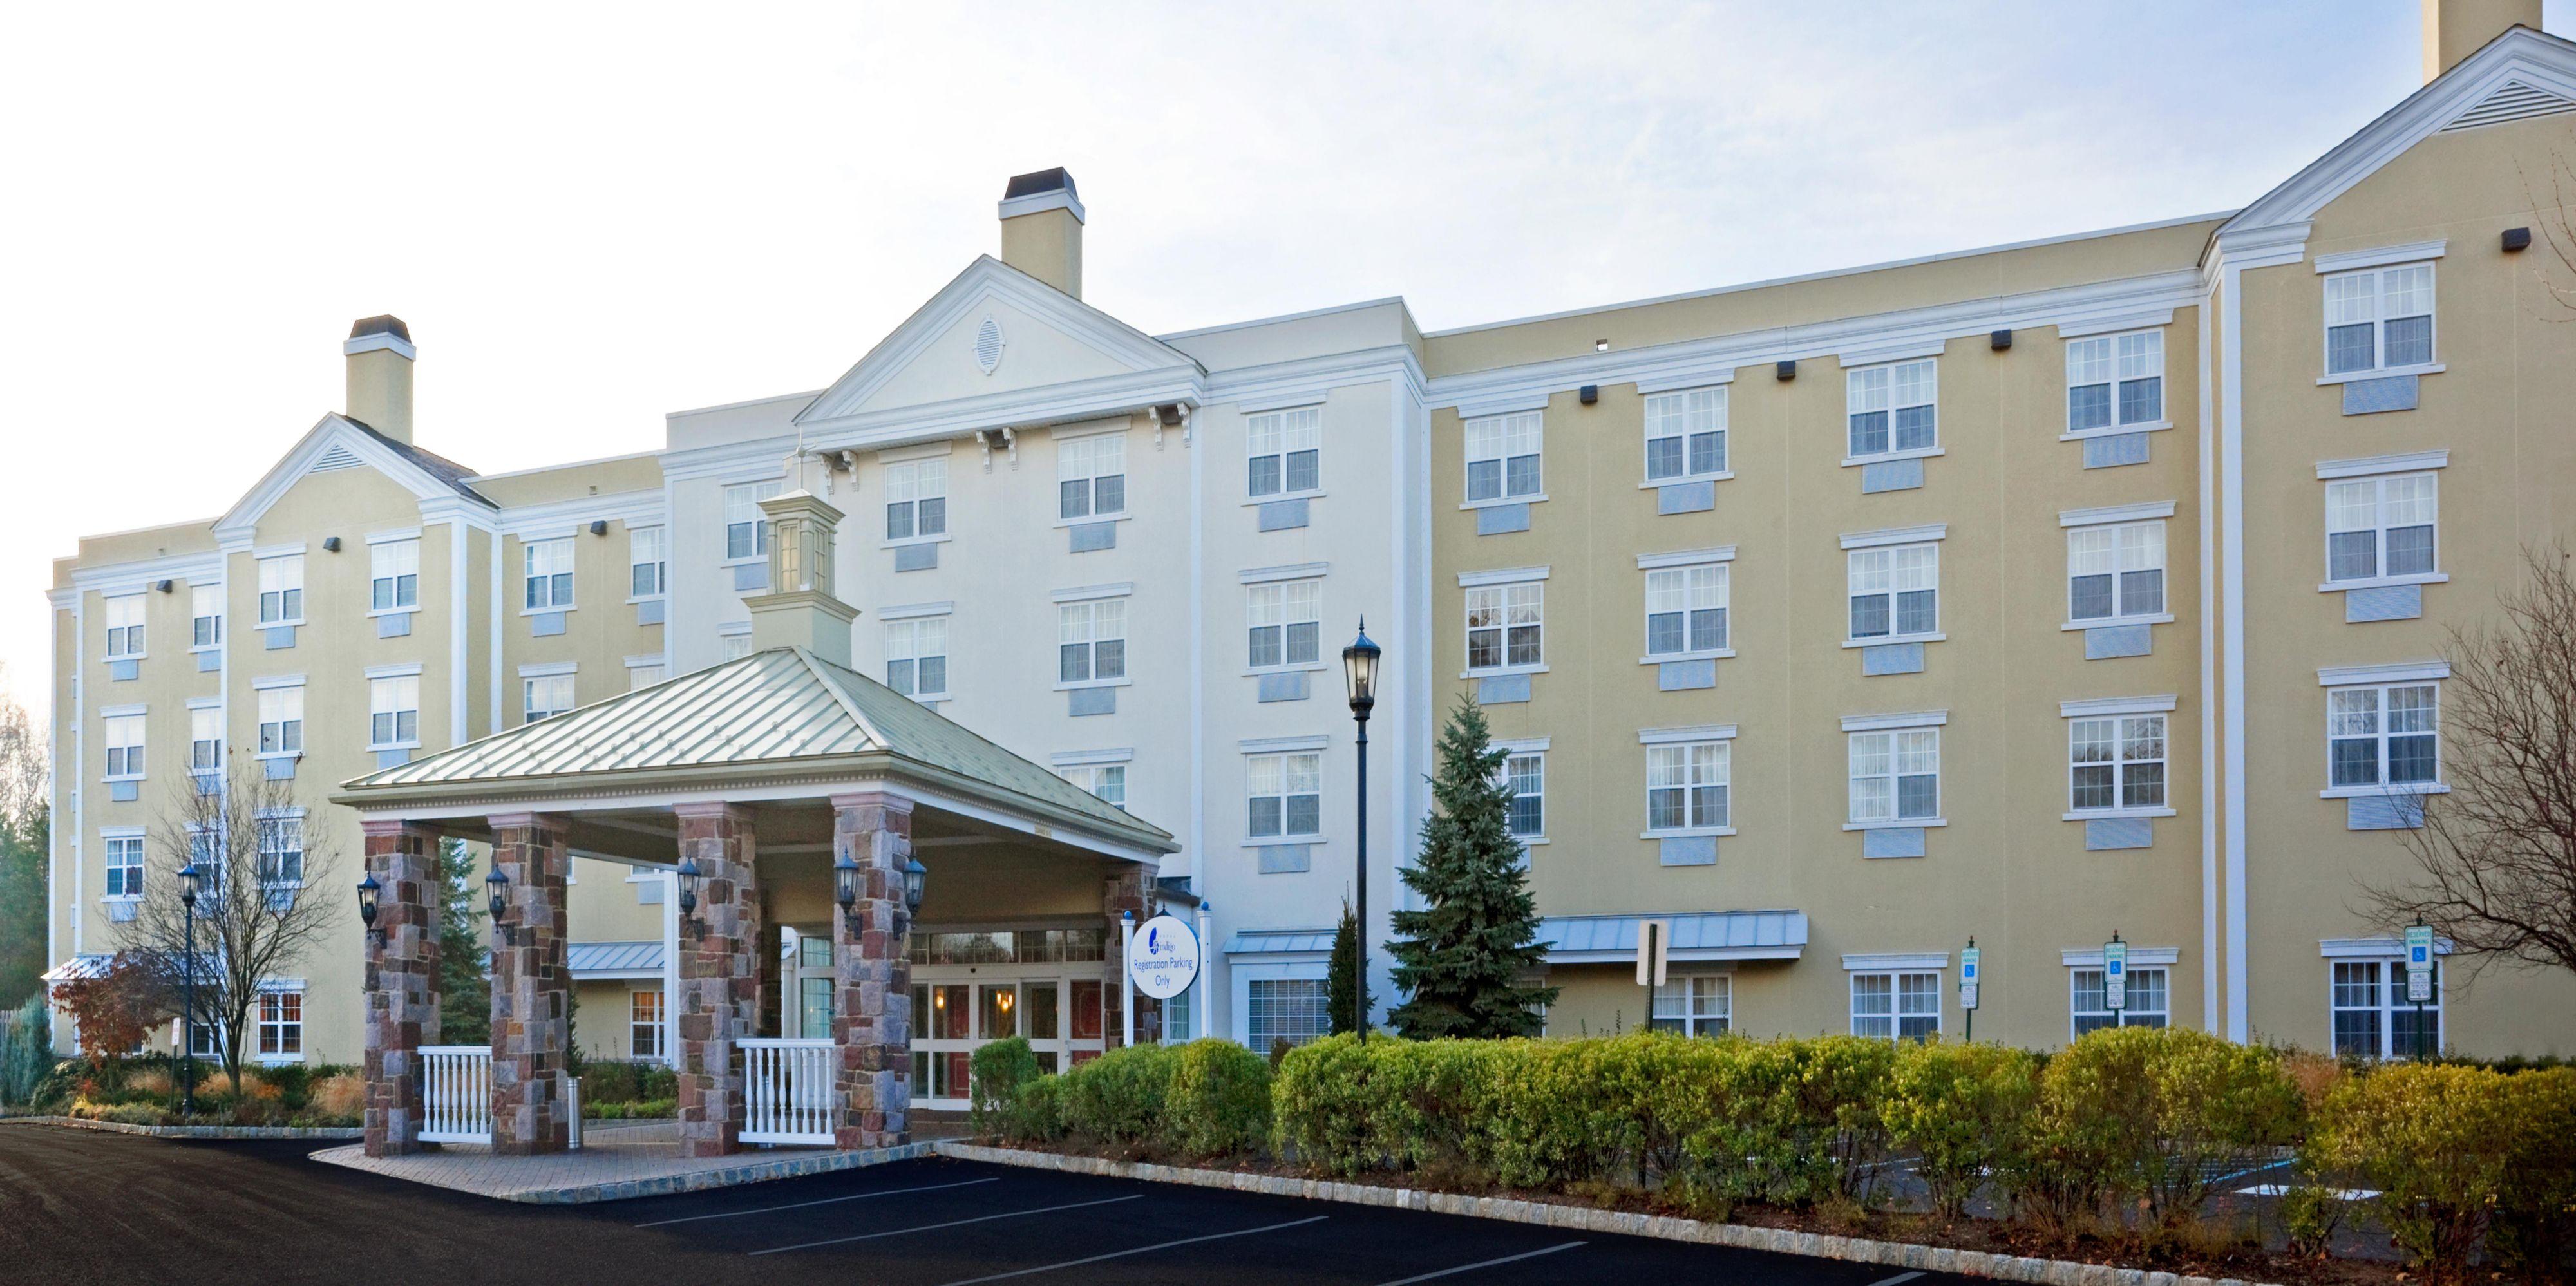 Basking Ridge Hotel Exterior